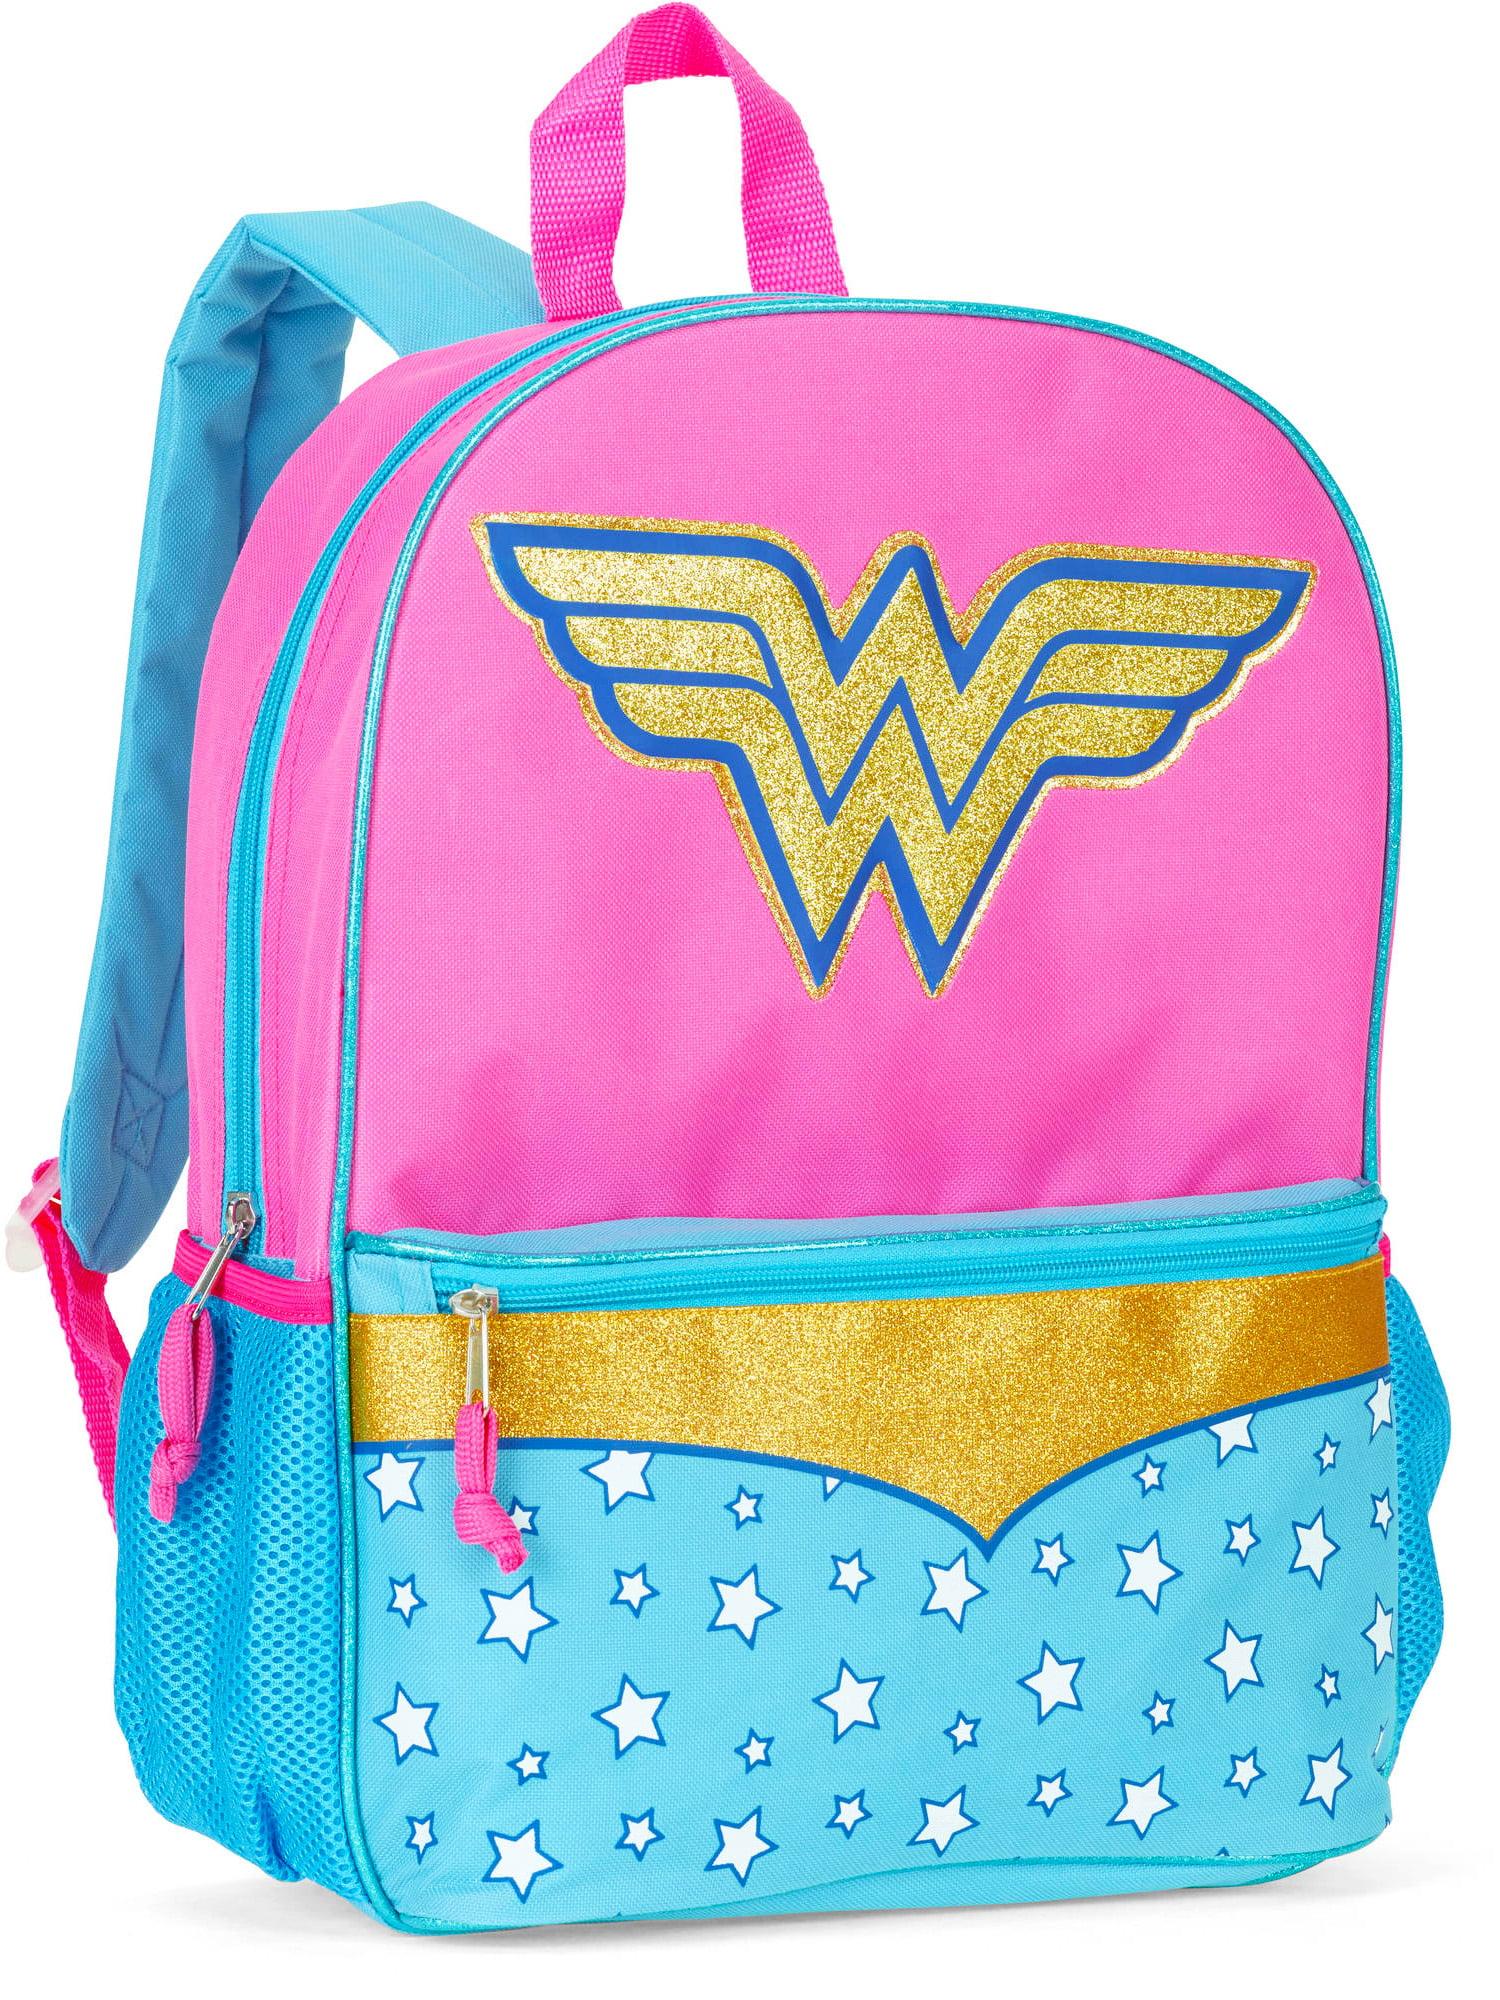 2e557fe6b4de DC Superhero Girls Wonder Woman Backpack with Glitter 16